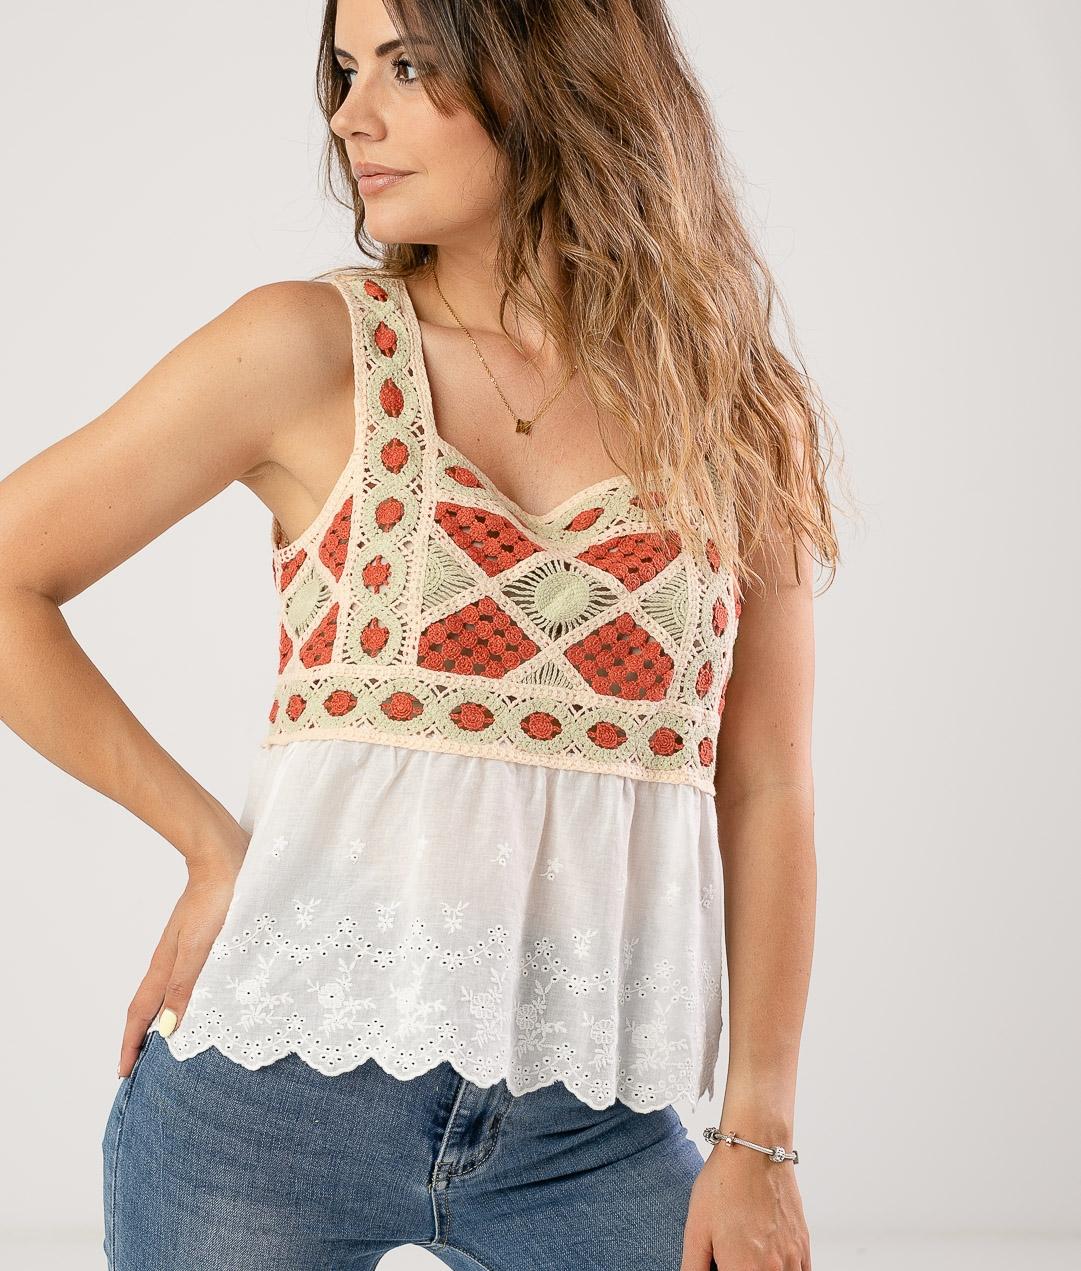 Camiseta Pentar - Coral